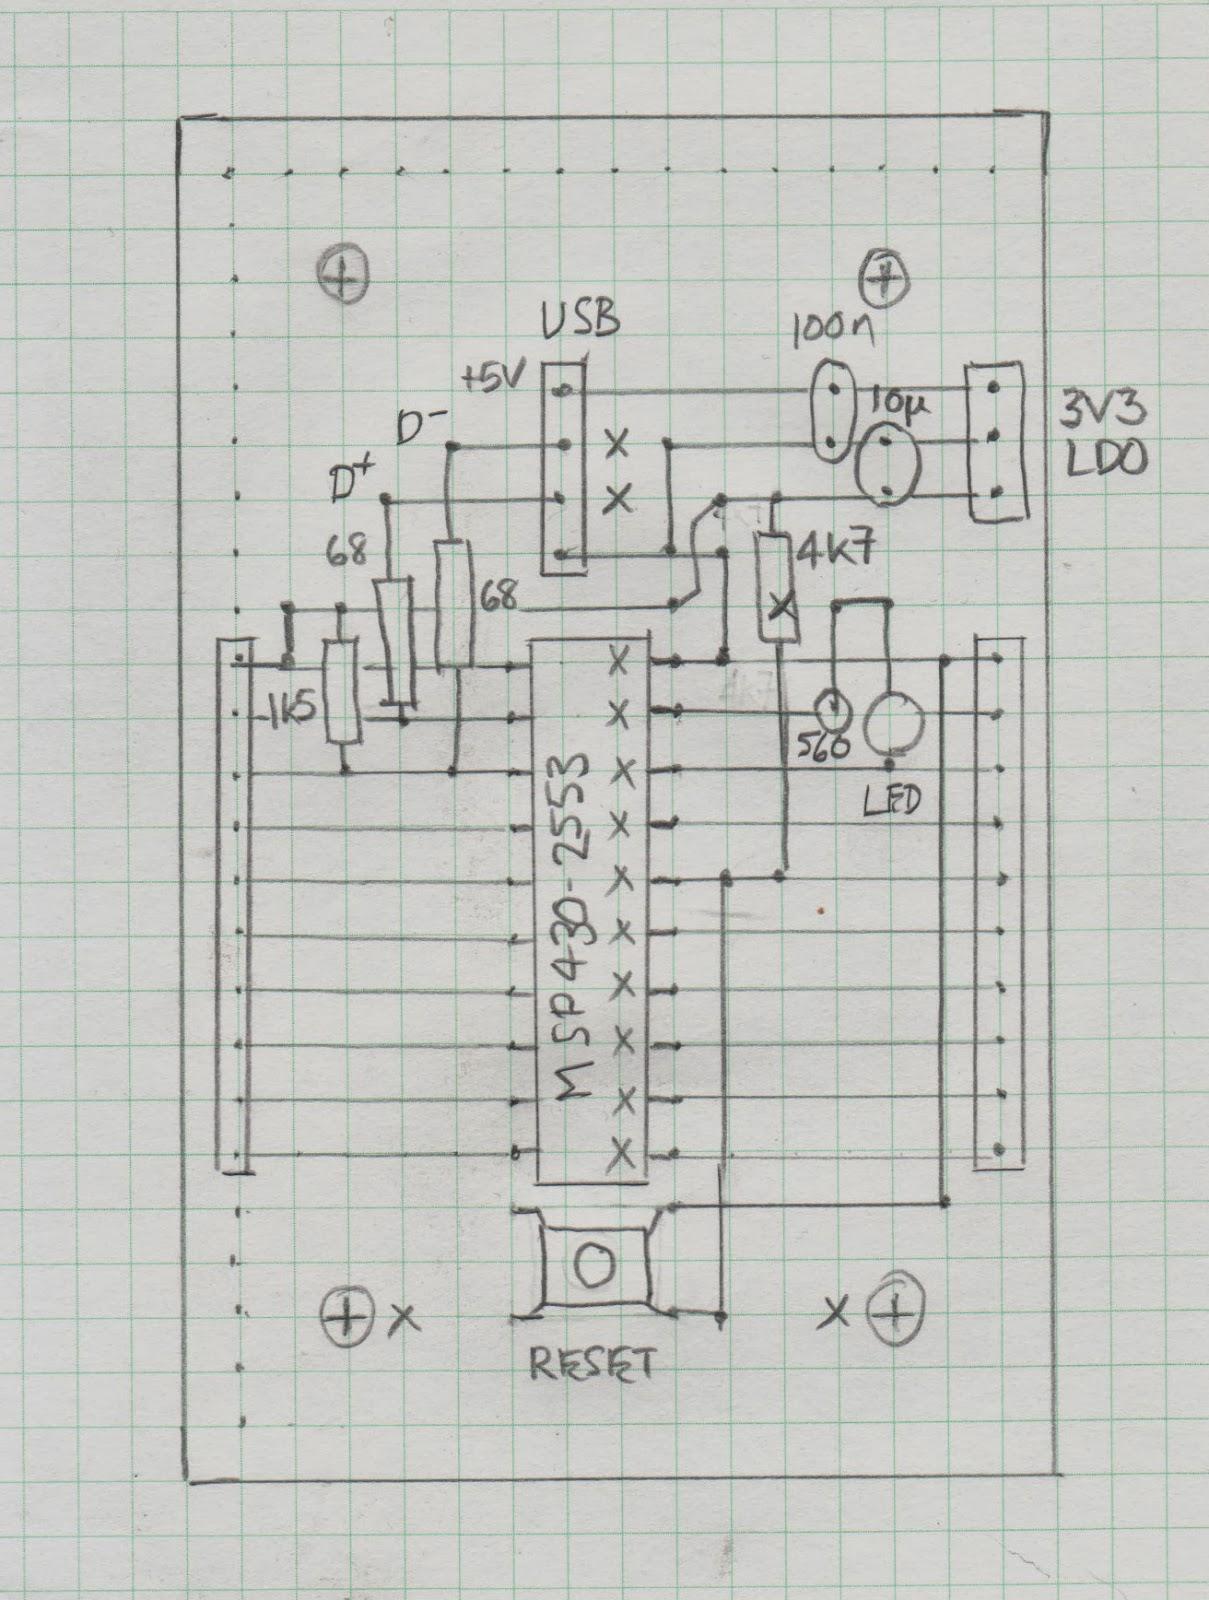 Bits On A Board Homebrew Msp430 Development Board